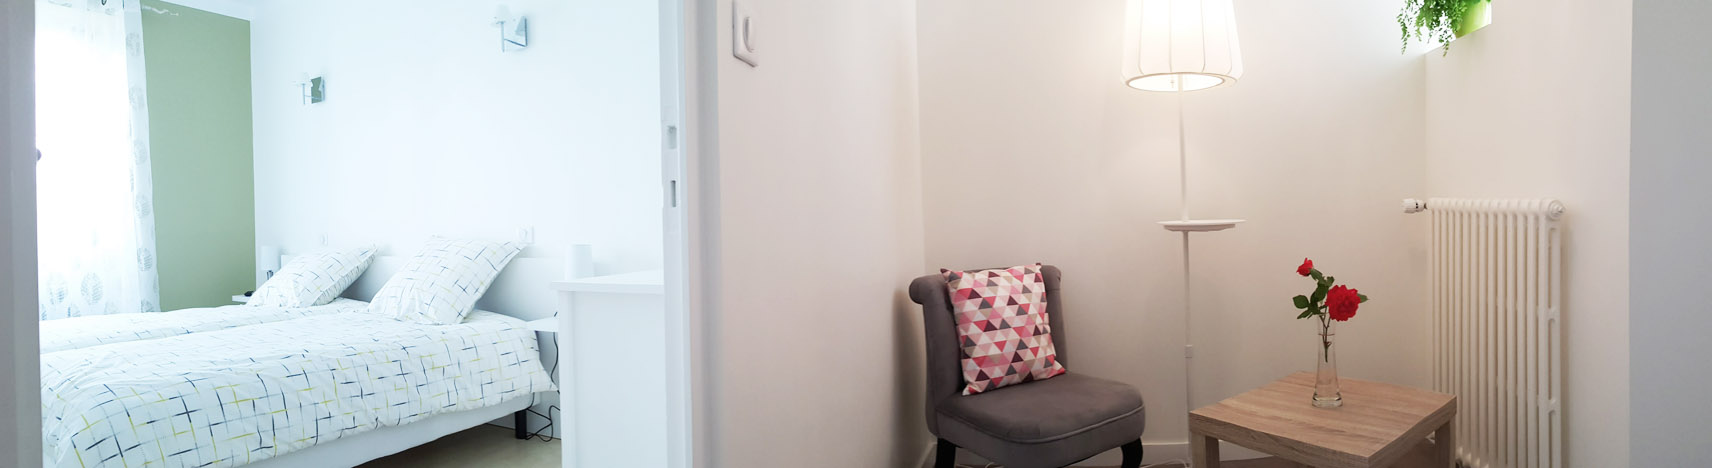 muscadine-chambre2-boudoir-diapo